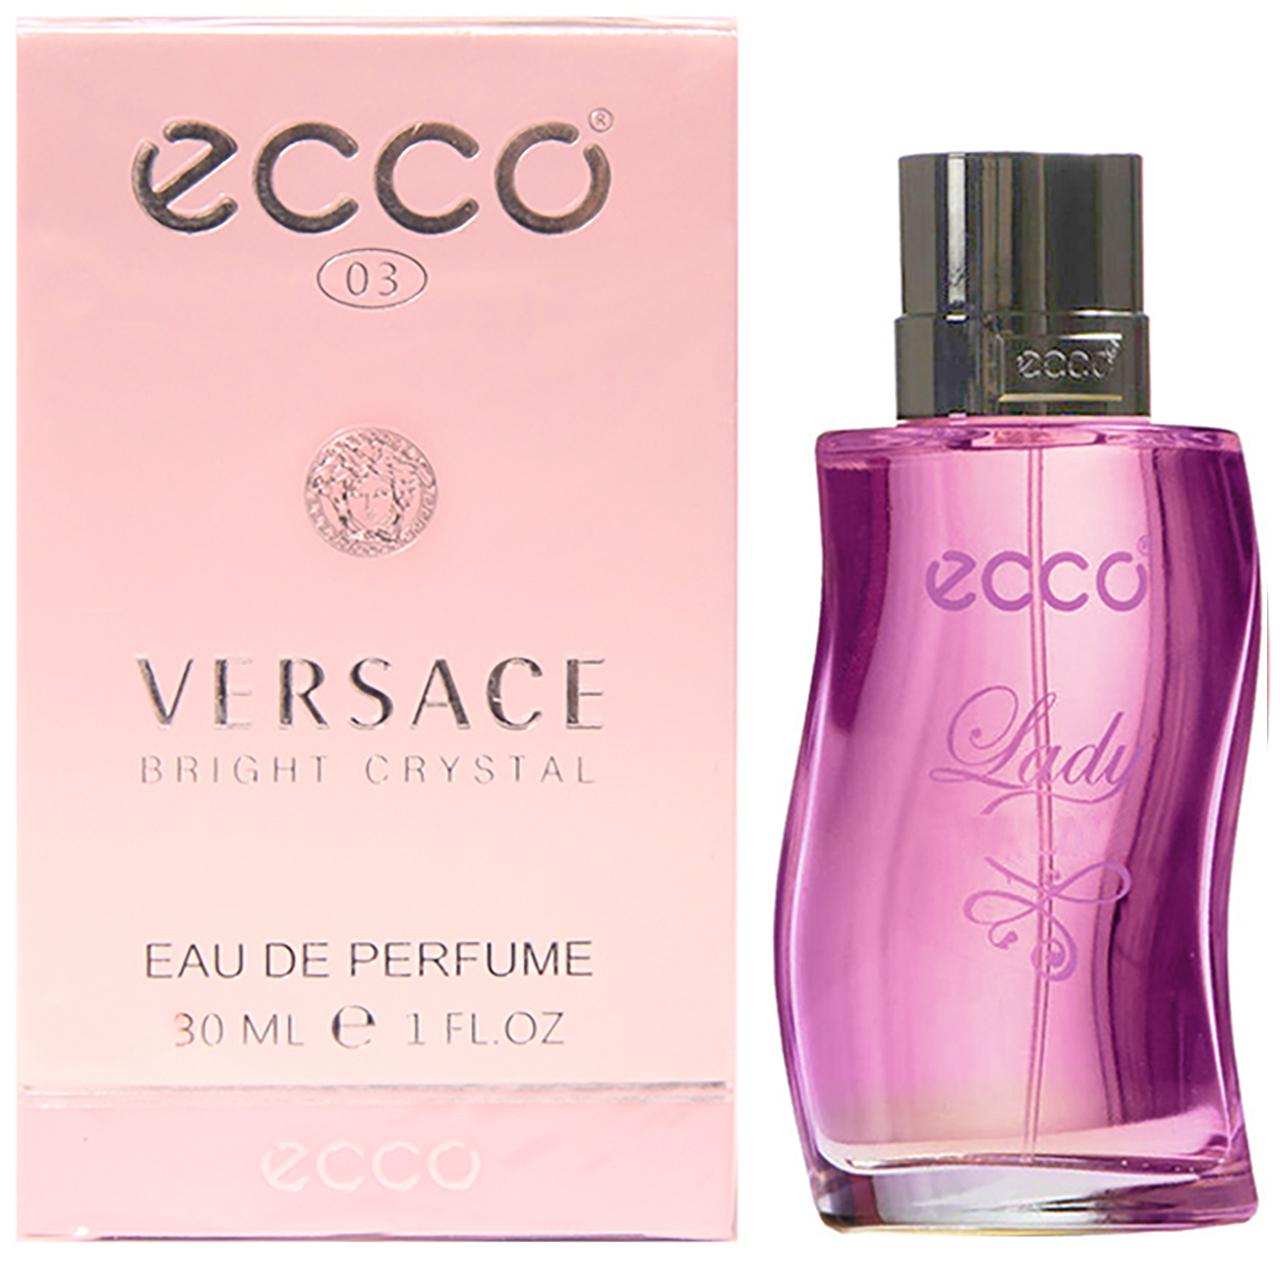 ادوپرفیوم زنانه اکو مدل Versace Bright Crystal حجم 30 میلی لیتر